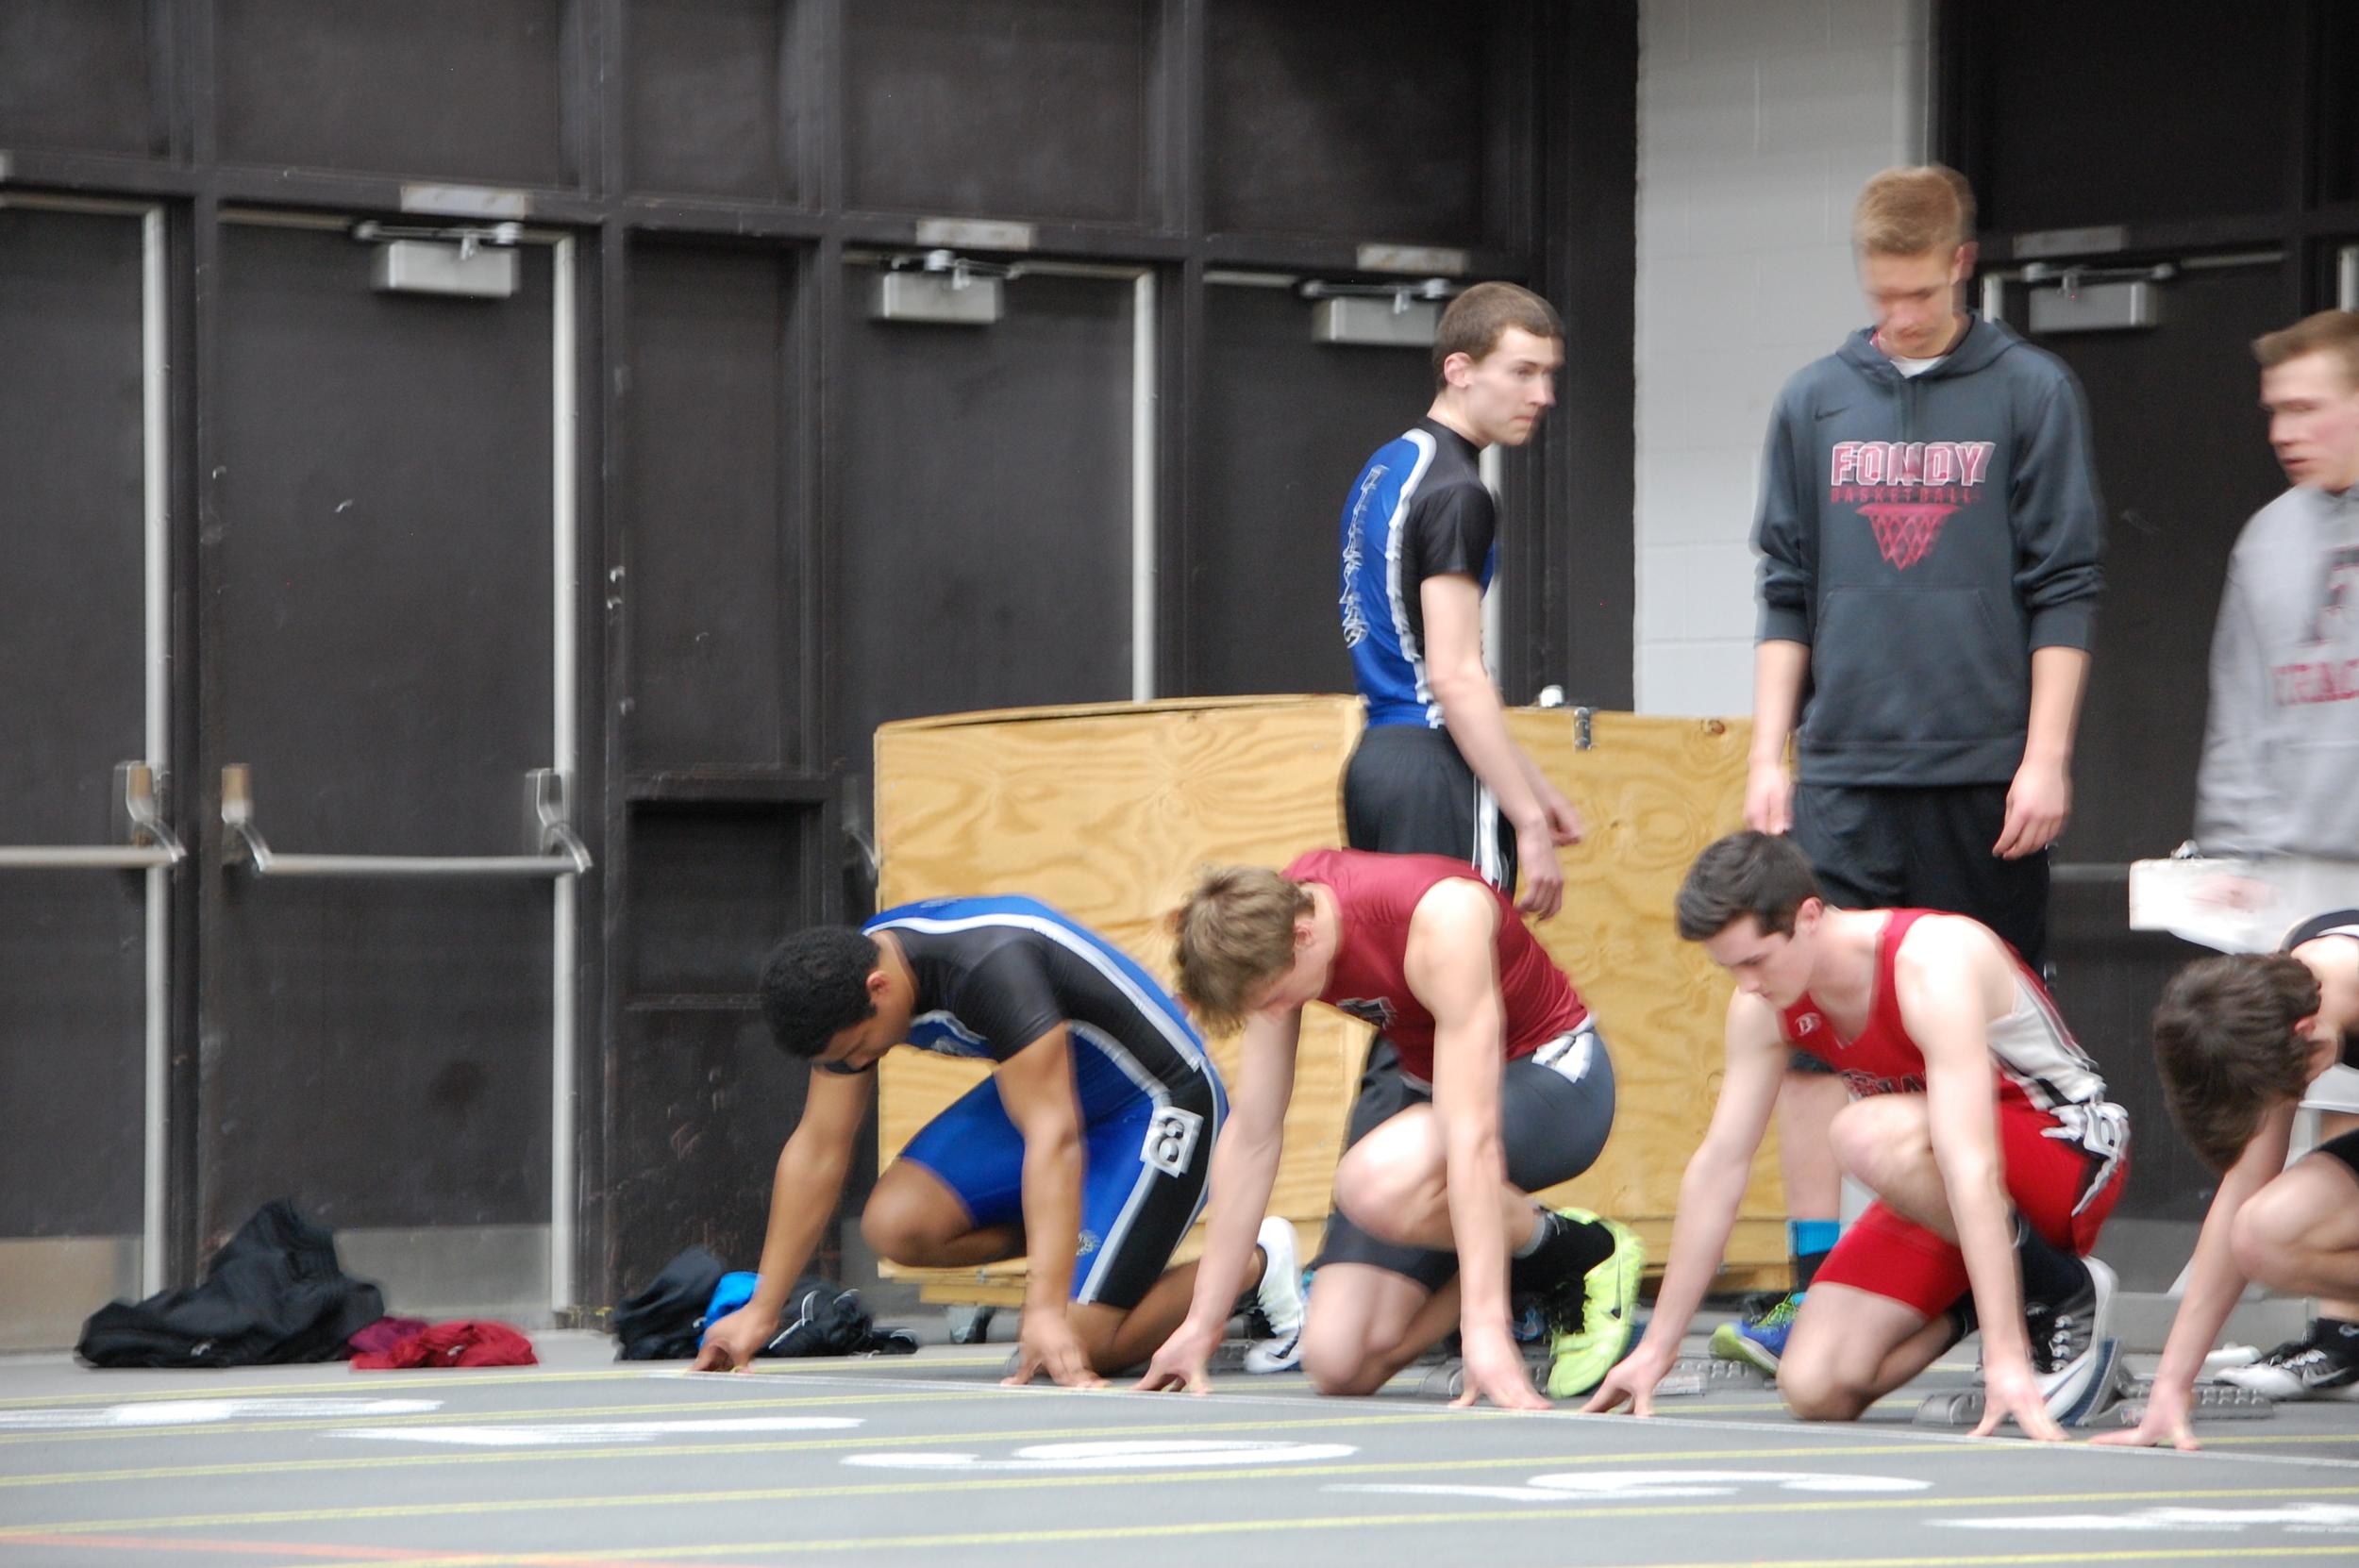 Deshawn Dickinson gets set in his blocks for the 60 meter hurdle finals.